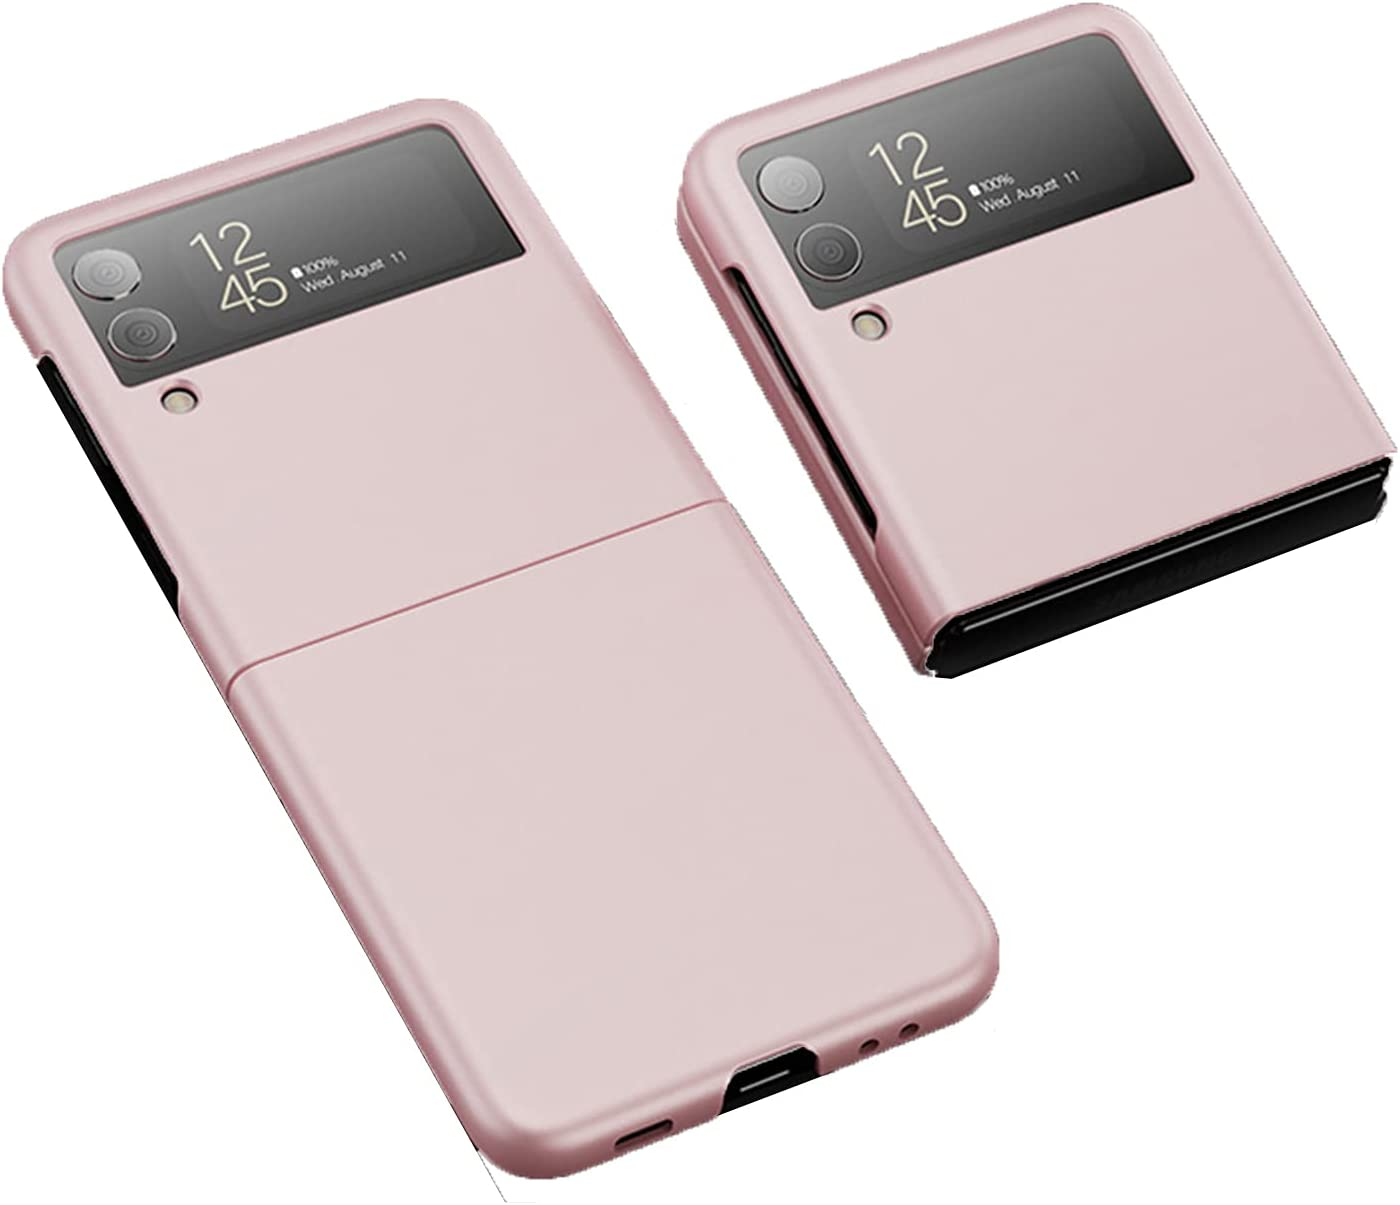 Zouzt Slim Thin Designed Back Cover Case for Samsung Galaxy Z Flip 3 / Z Flip3 5G Case (2021) - Hard Back Case Cover- Rose Golden